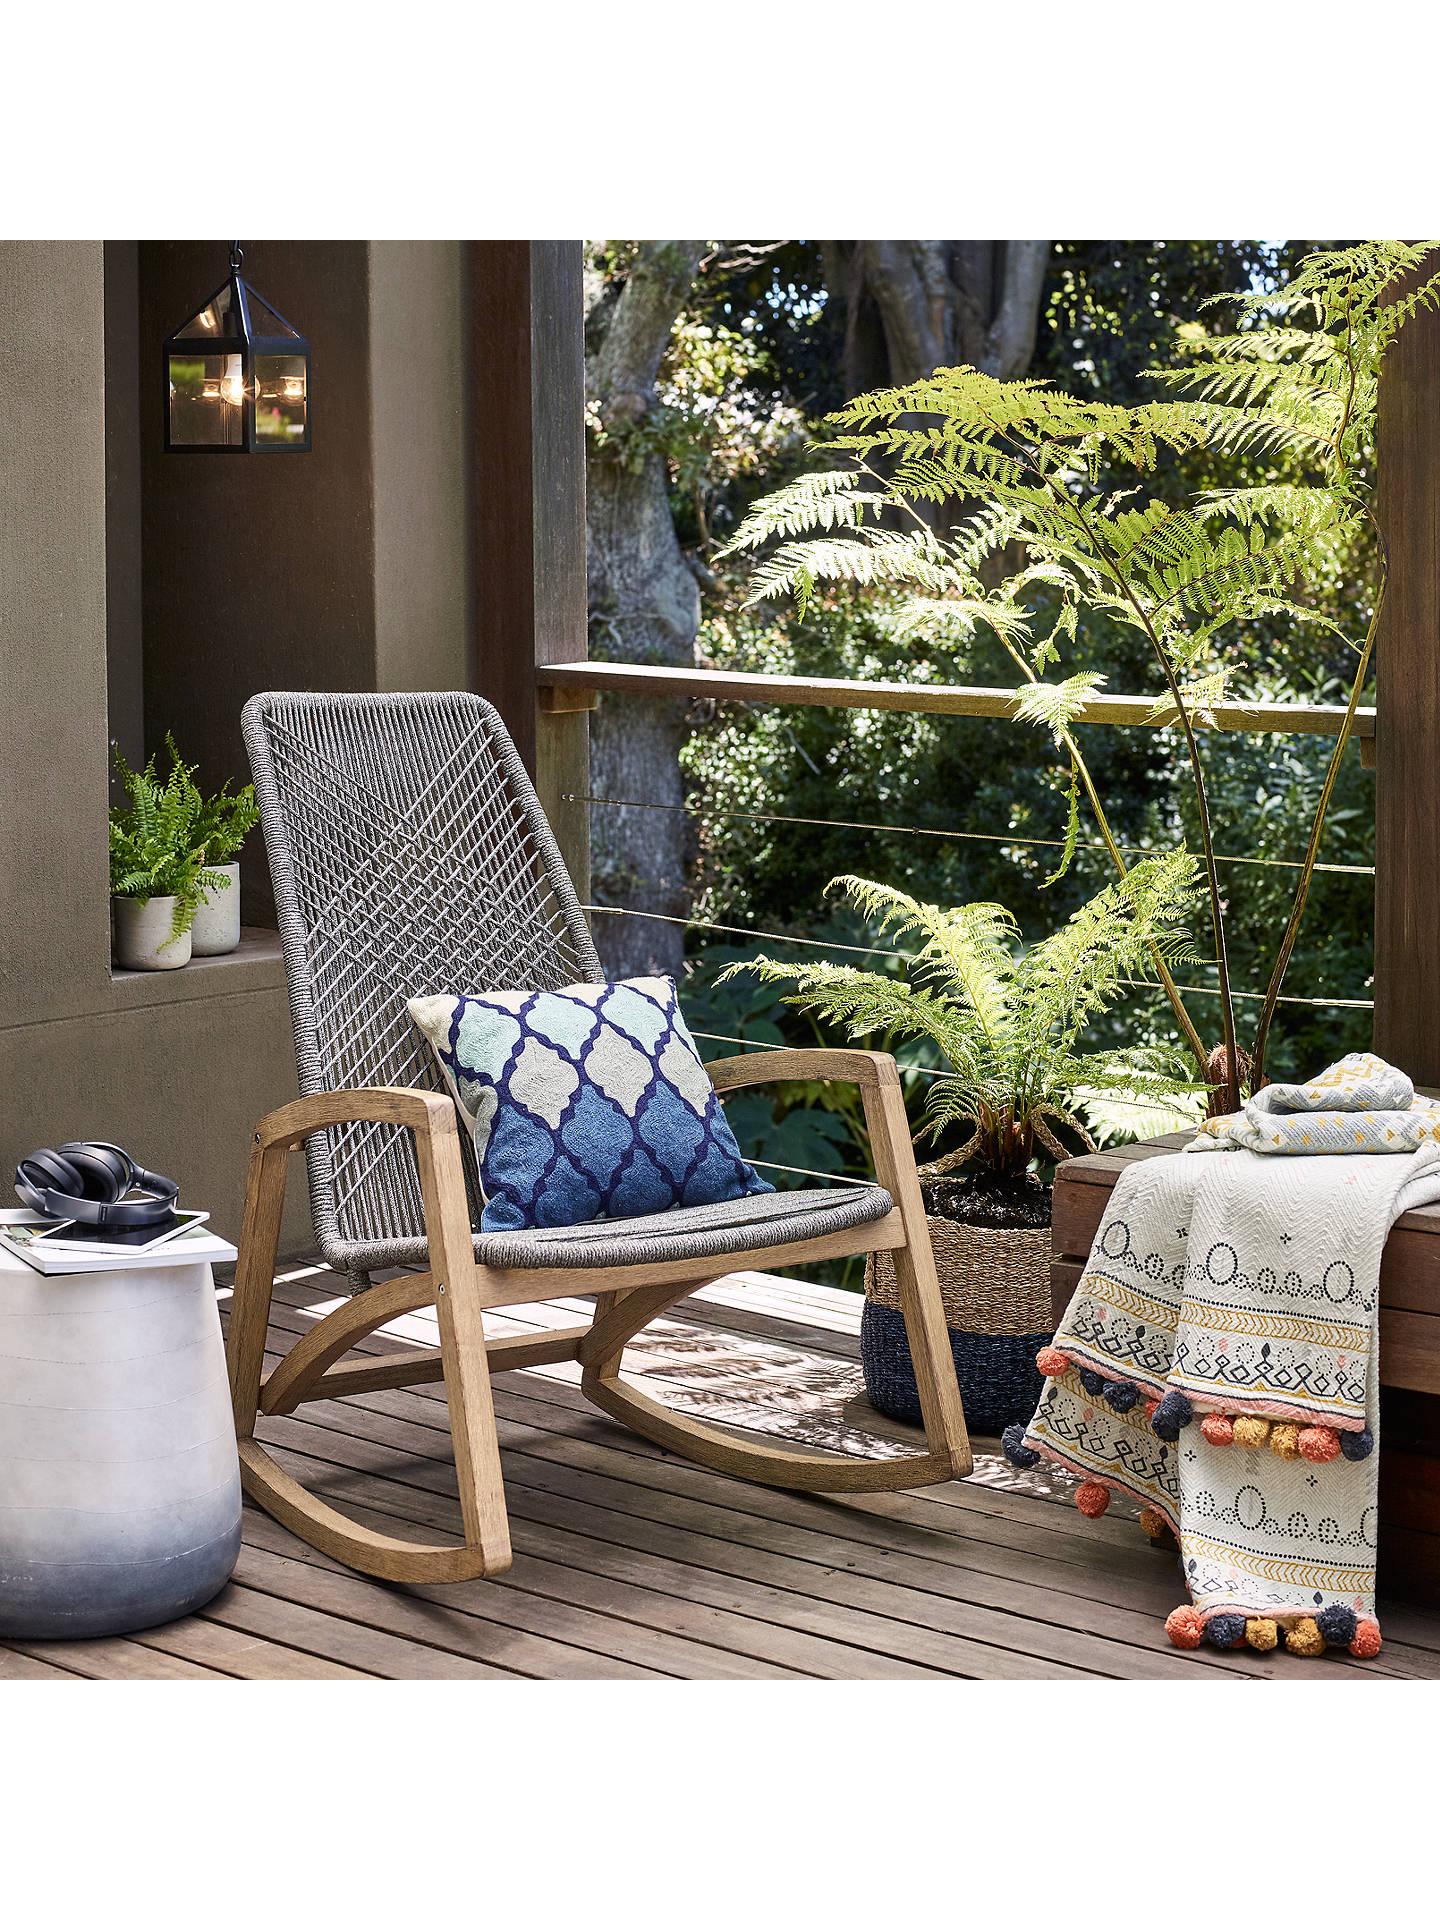 Peachy John Lewis Leia Outdoor Rocking Chair Fsc Certified Cjindustries Chair Design For Home Cjindustriesco